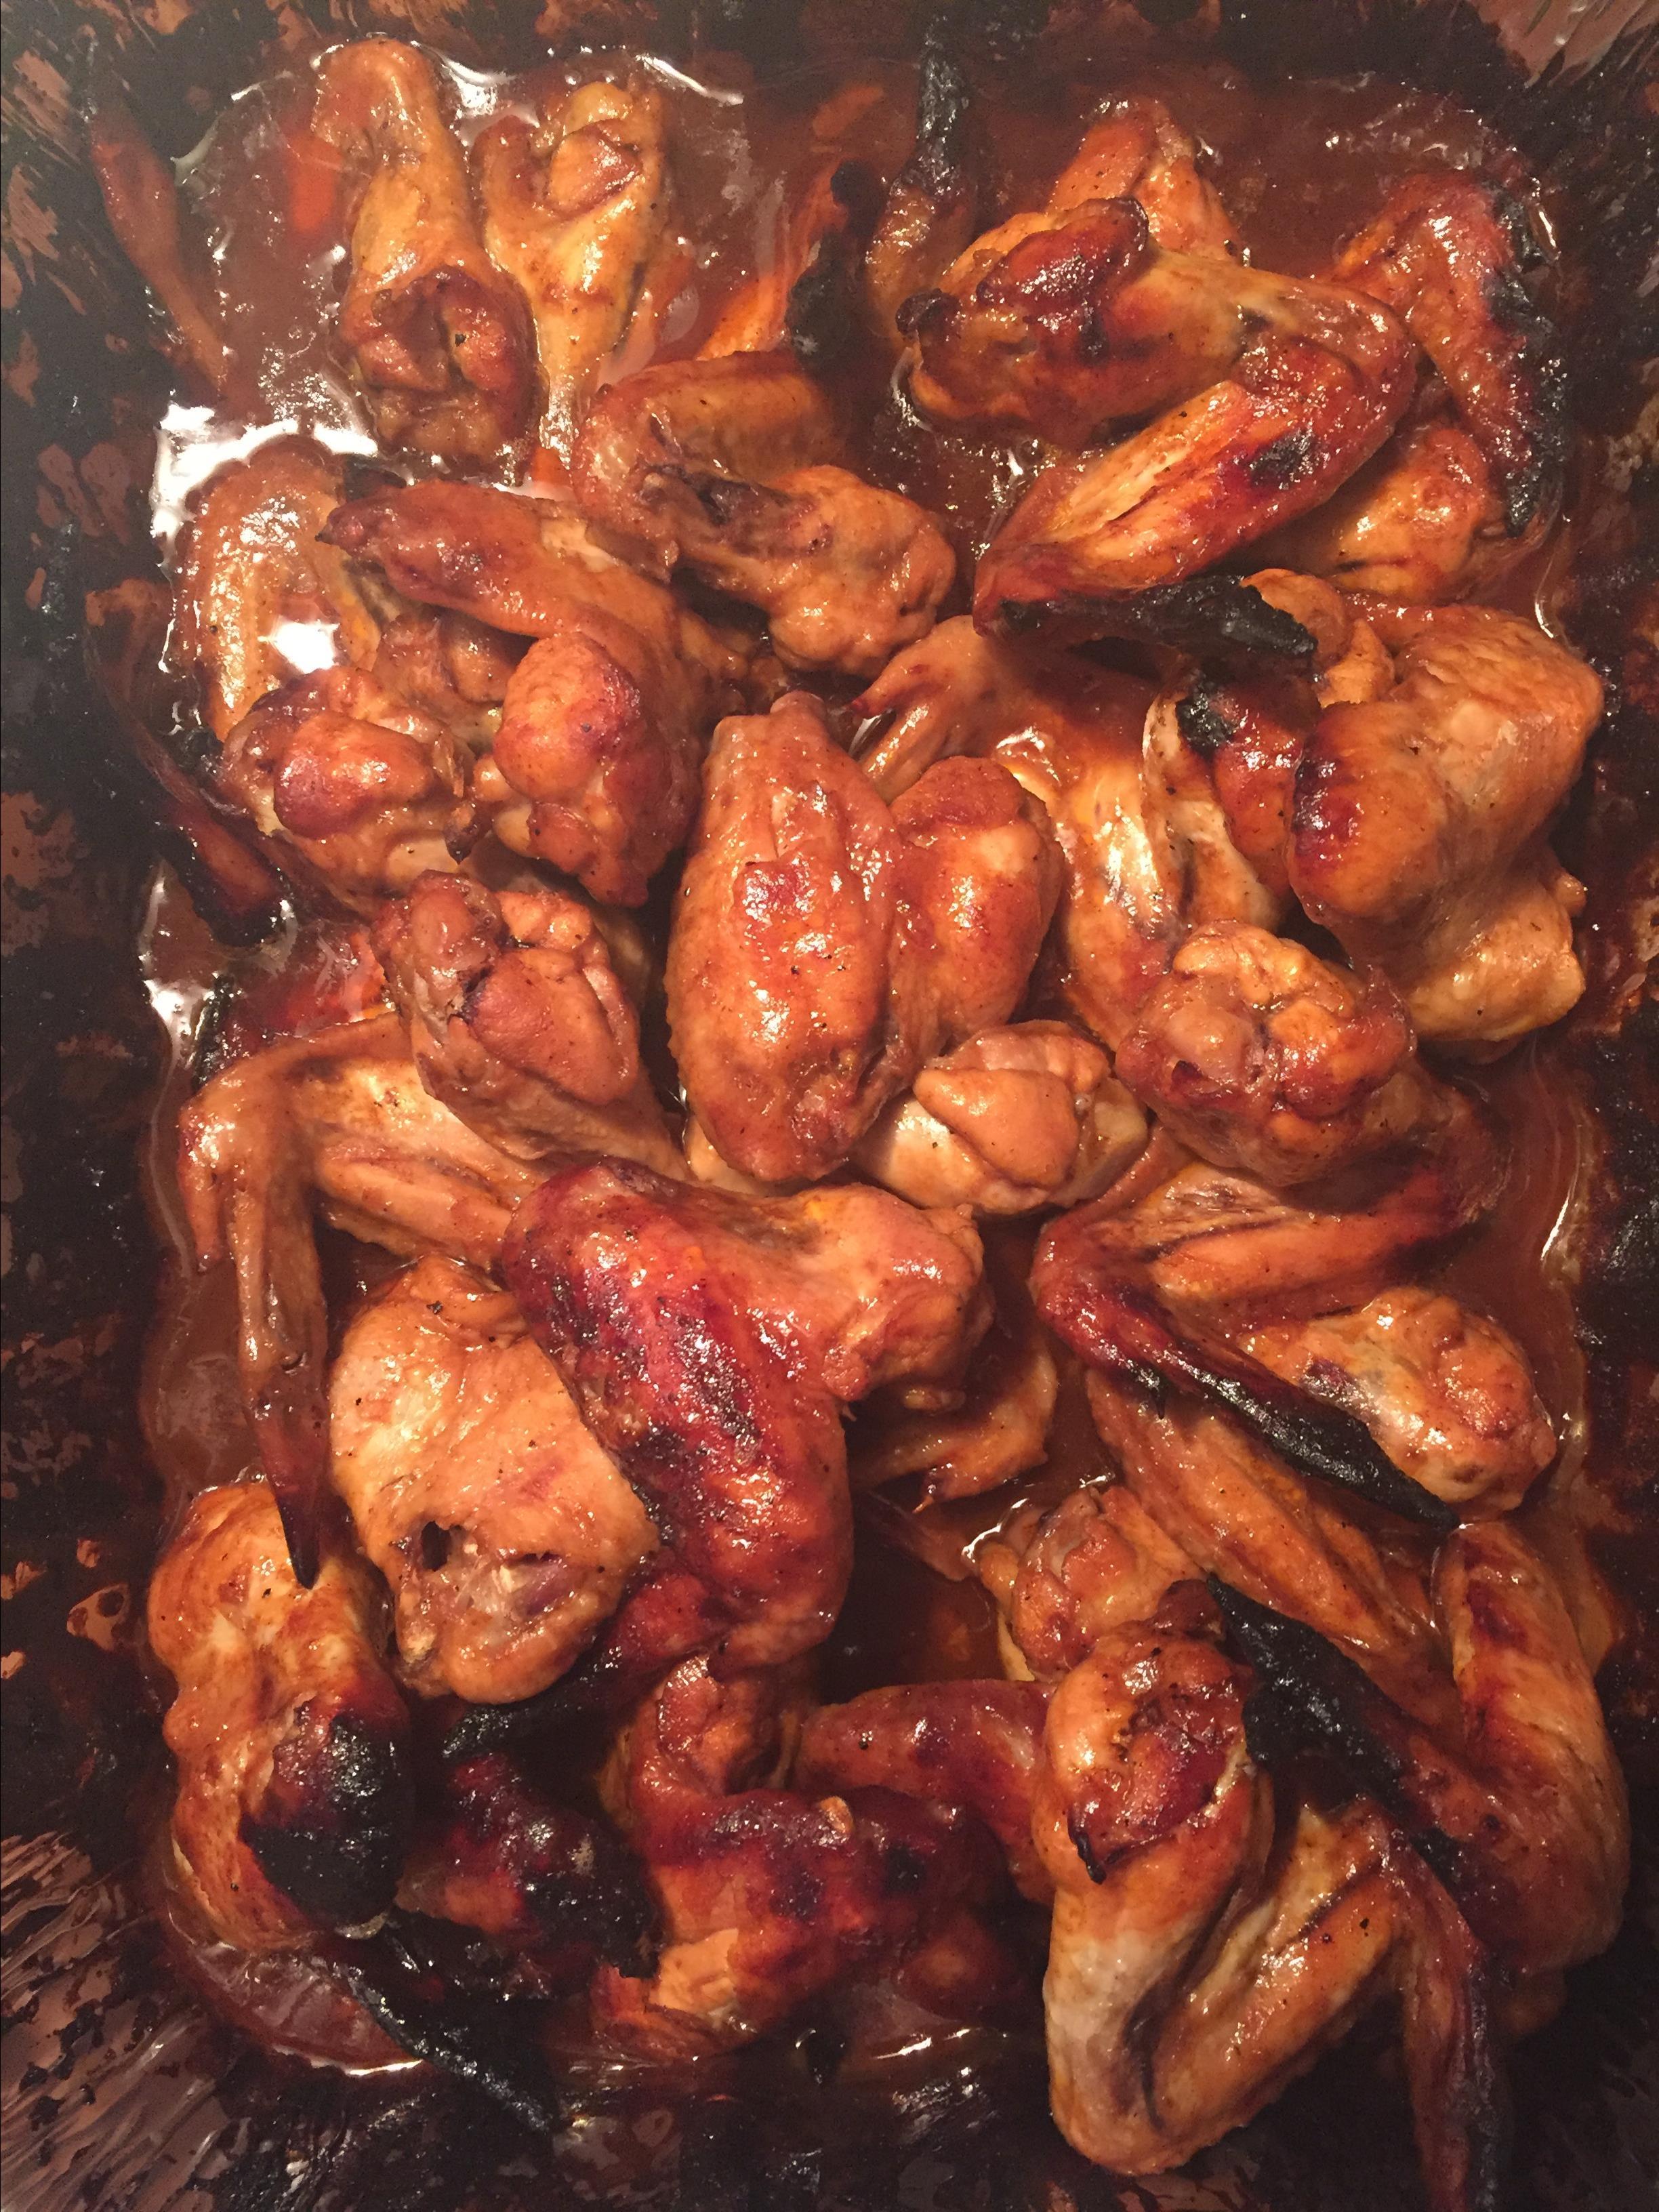 3-Ingredient Baked BBQ Chicken Wings Lisa Suzanna Stratton